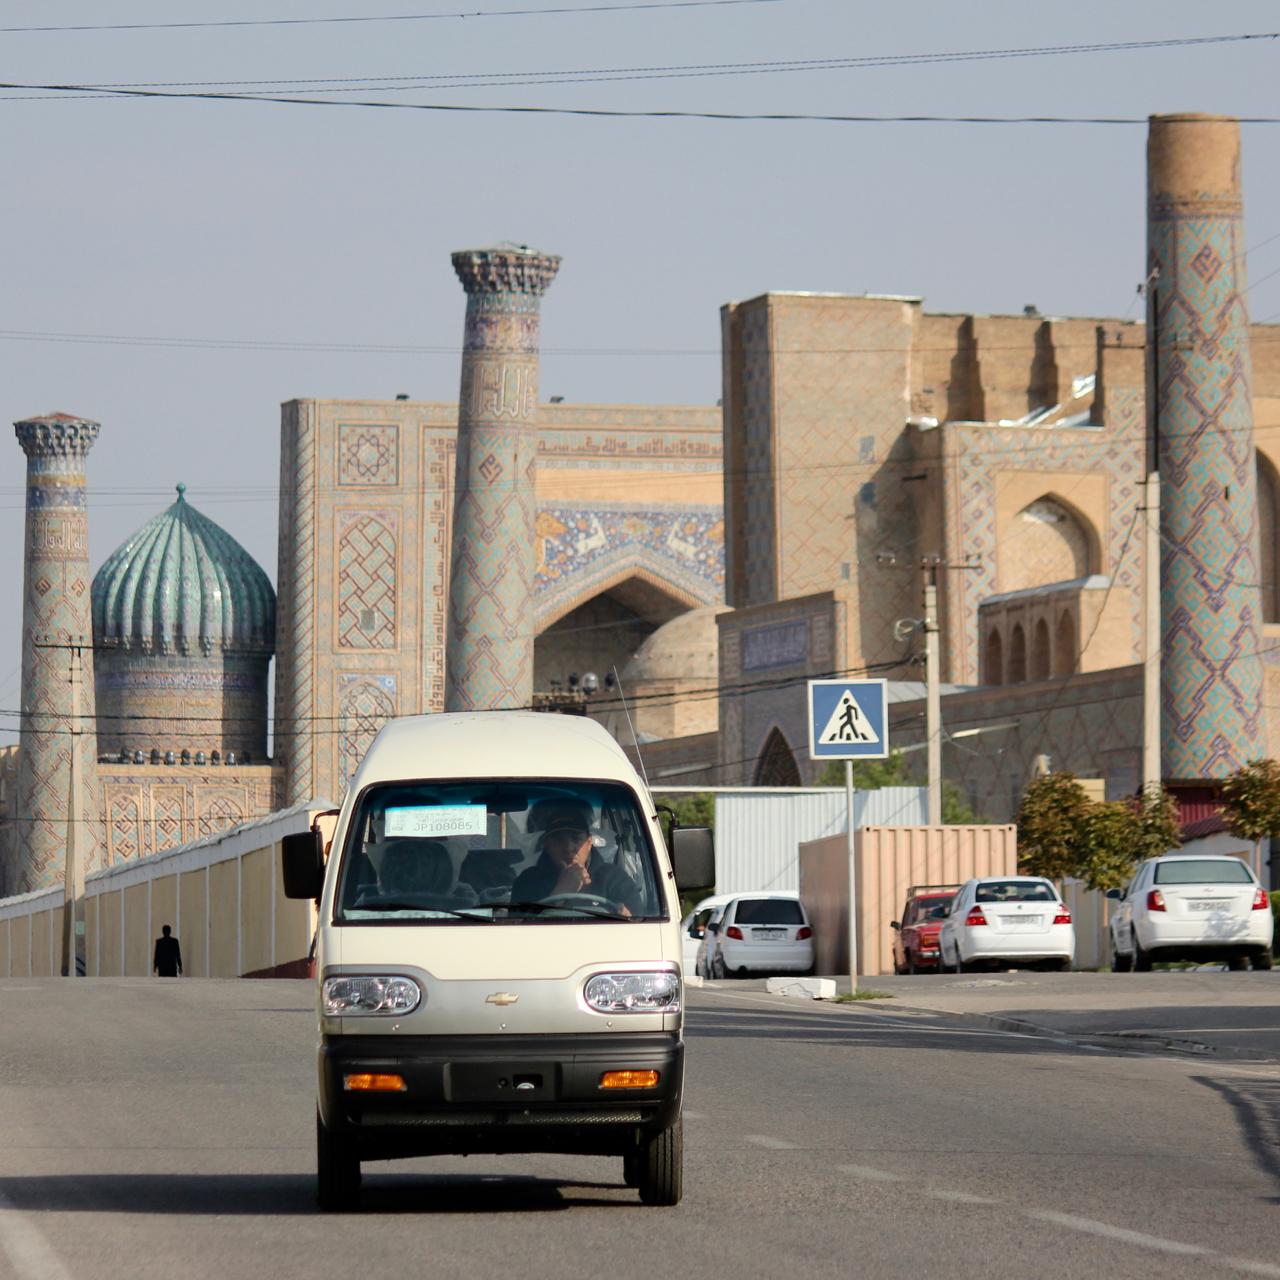 samarkand, uzbekistan - 13